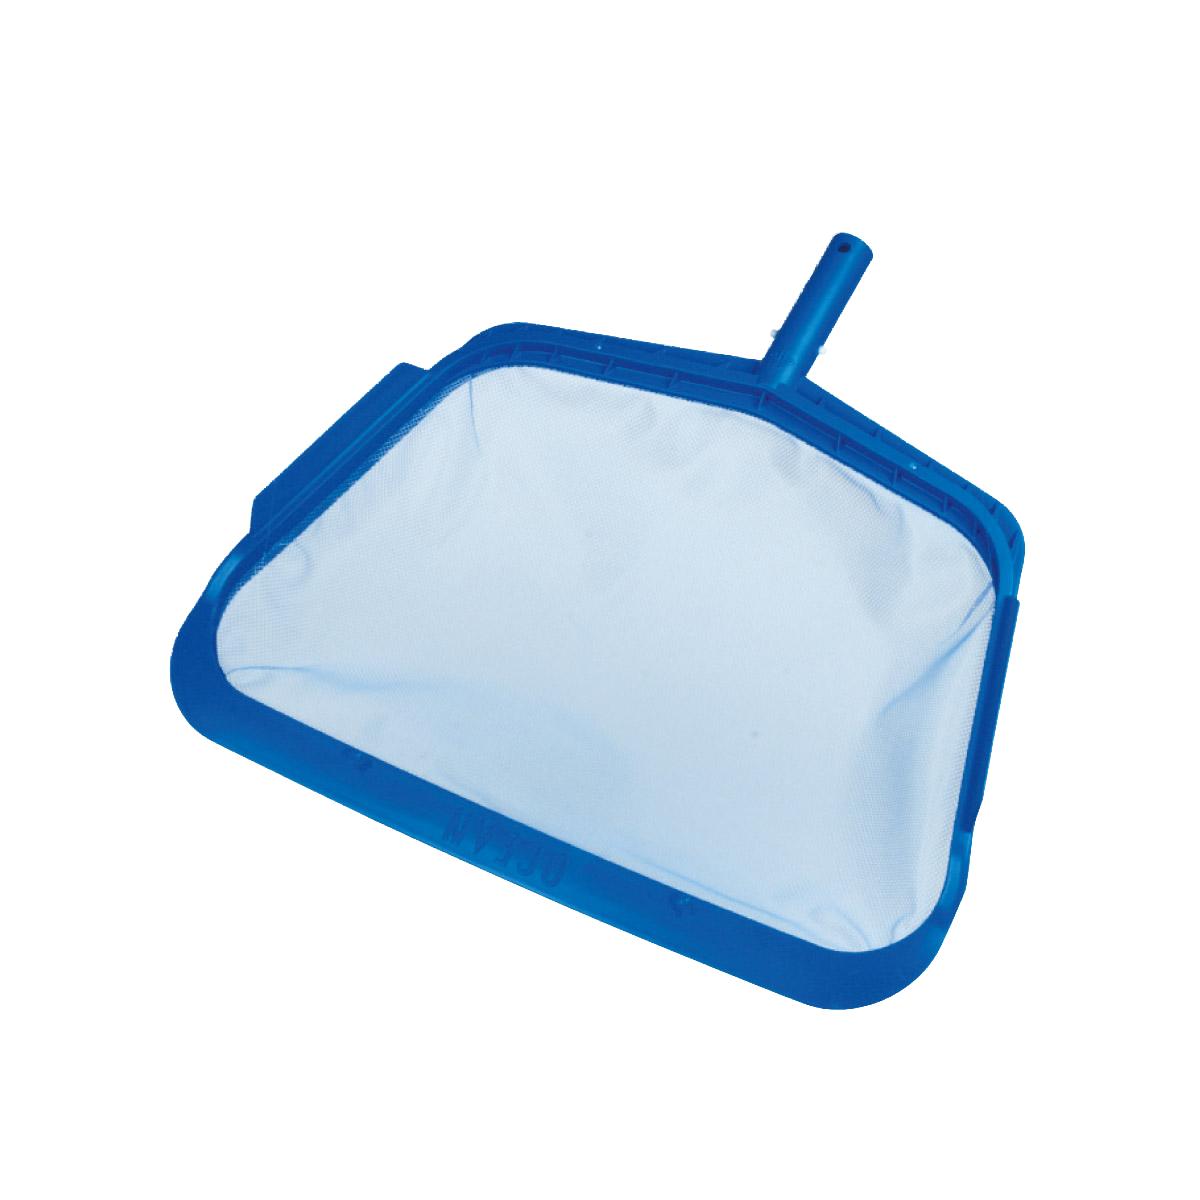 Leaf Skimmer Ocean De Luxe PP blue loose packing Leaf Skimmer Ocean De Luxe PP blue loose packing